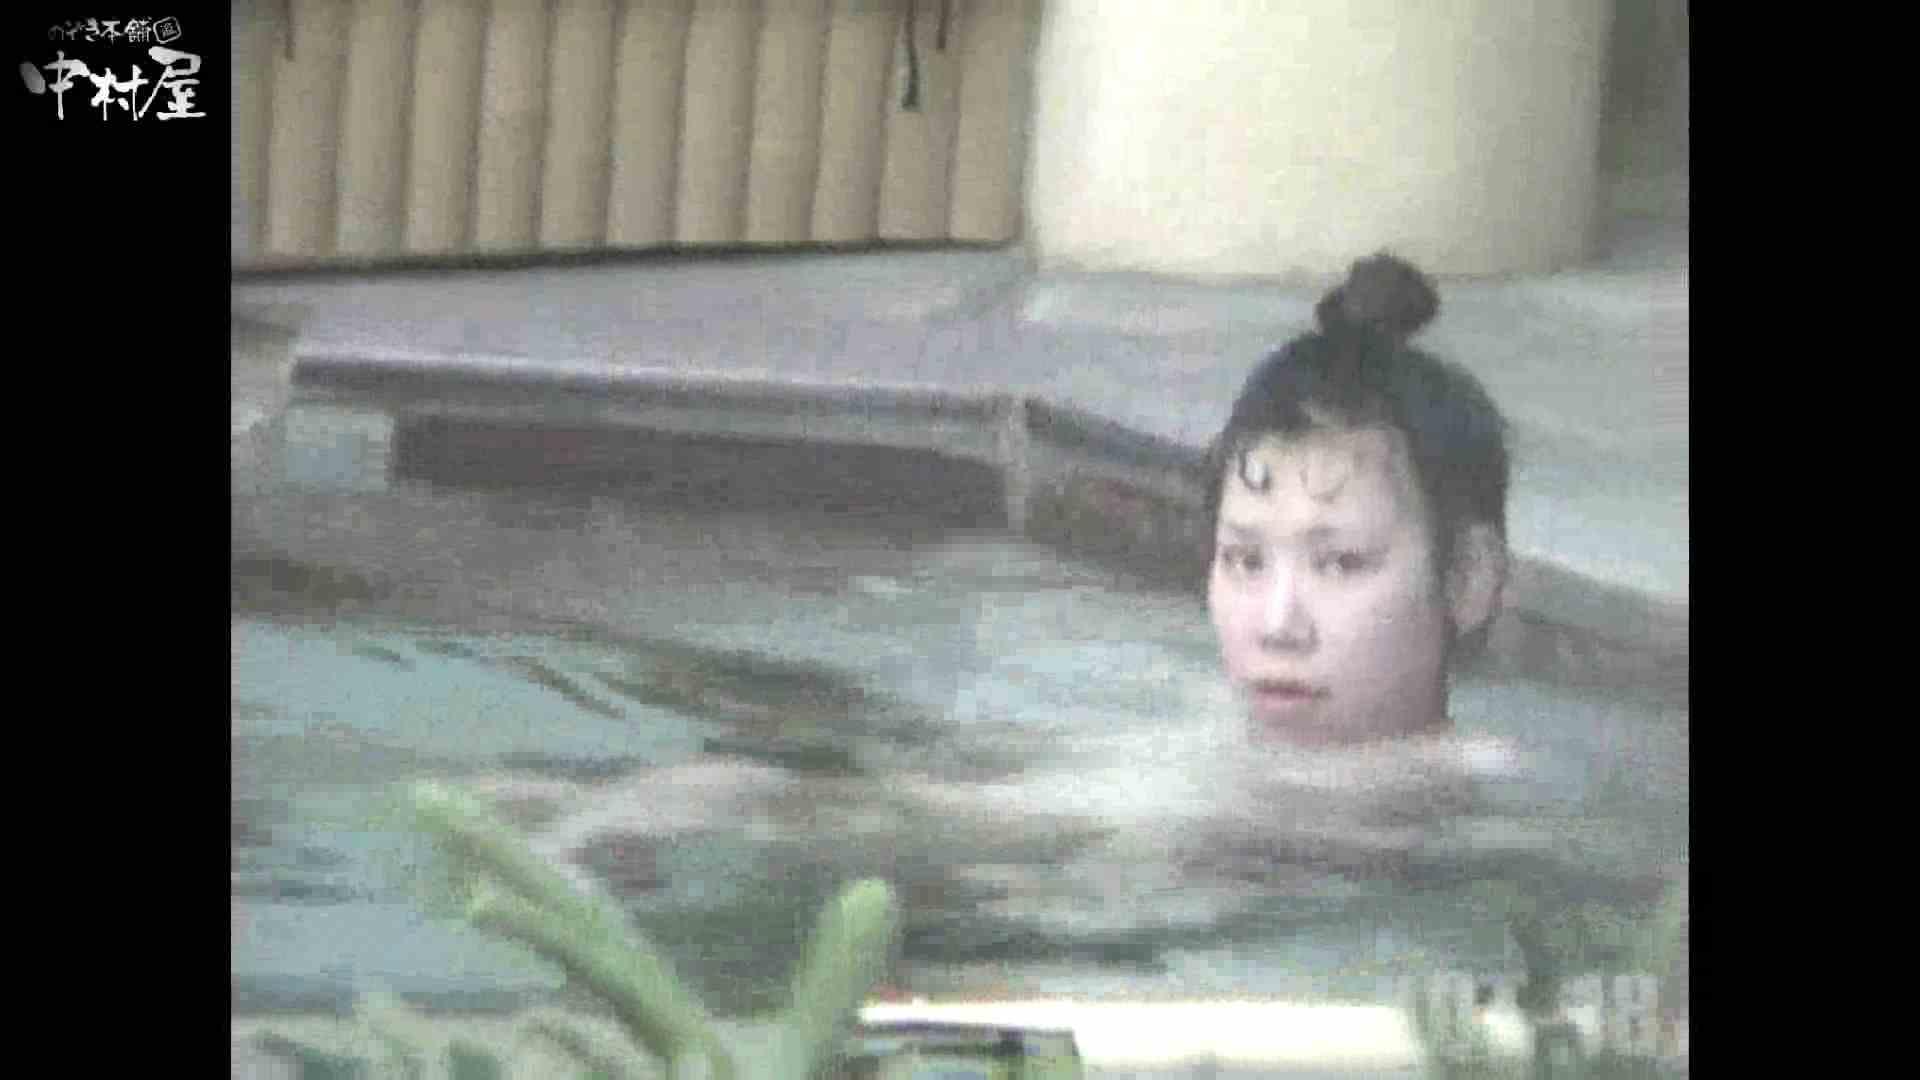 Aquaな露天風呂Vol.882潜入盗撮露天風呂十八判湯 其の二 潜入 女性器鑑賞 61連発 8